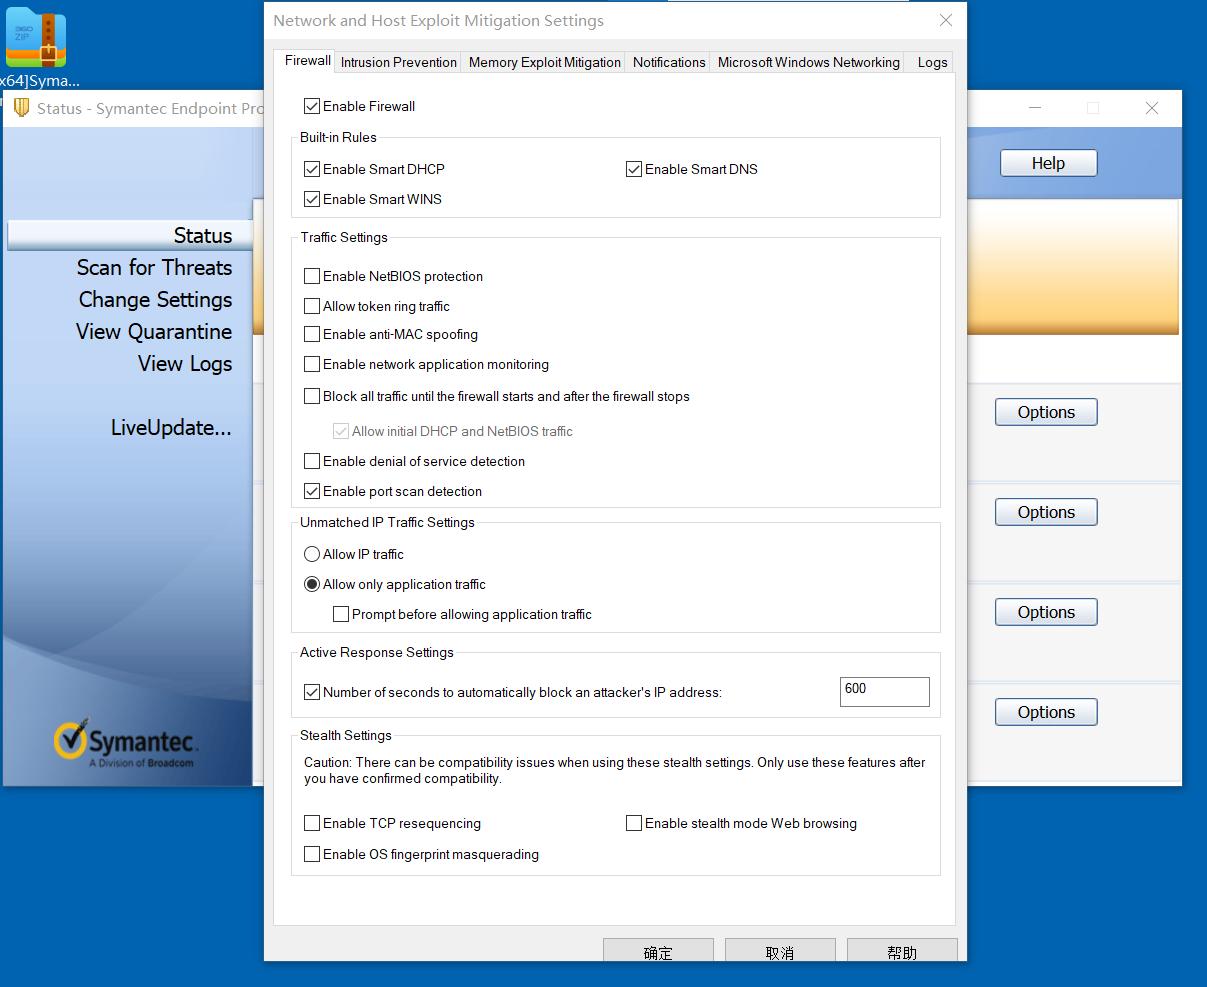 诺顿杀毒企业版 Symantec Endpoint Protection14.3.3384.1000 (x64及x86)-PK技术网